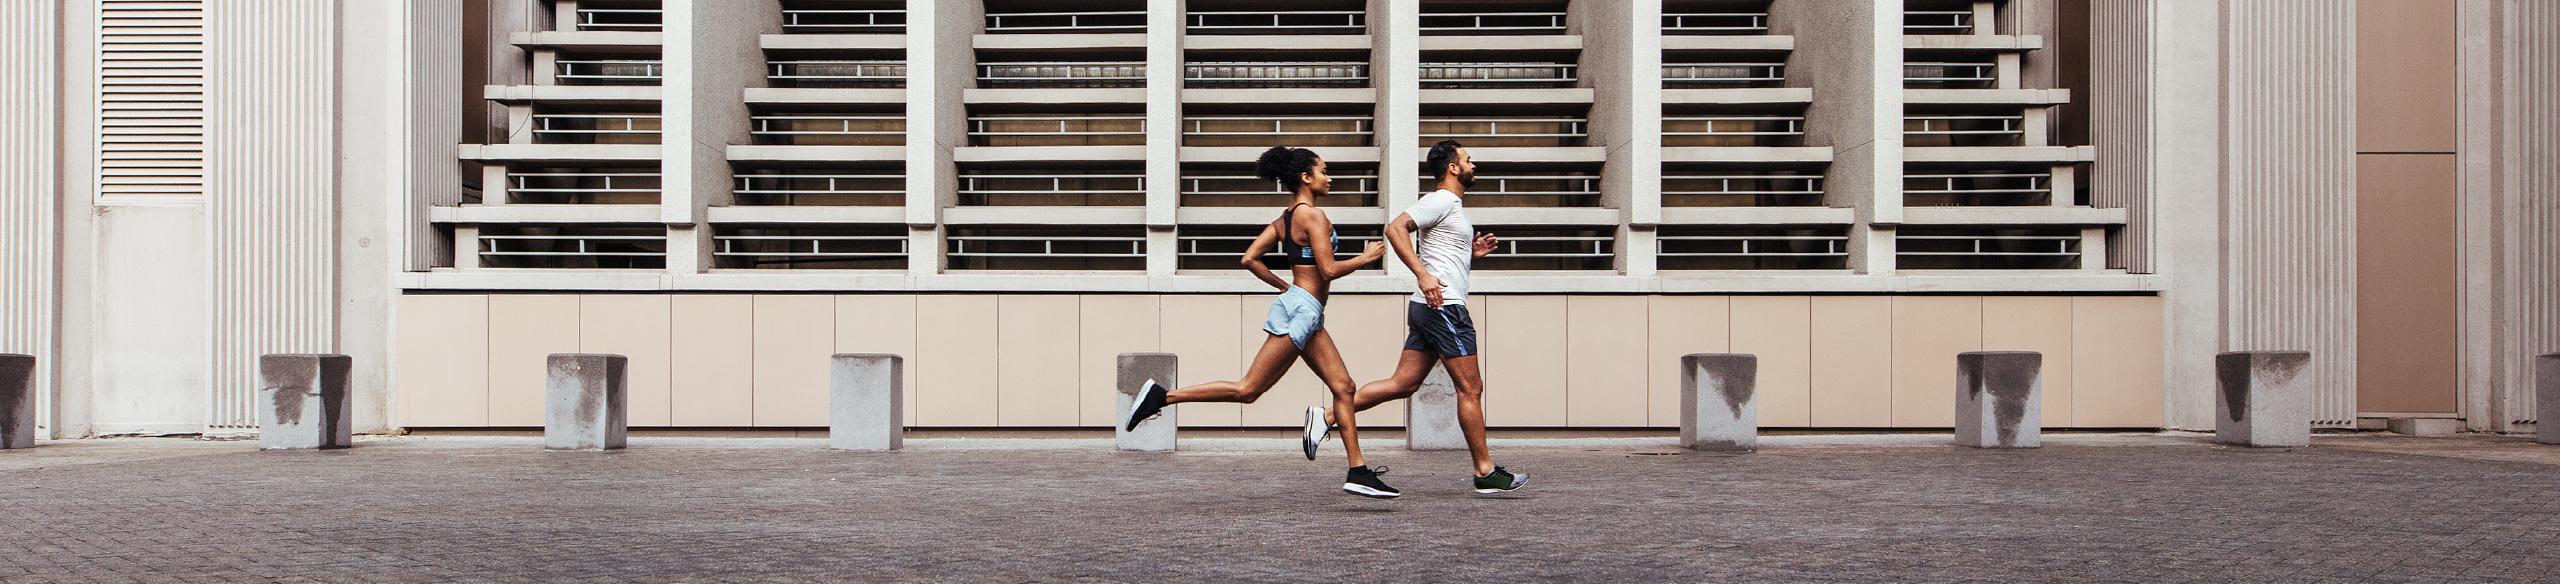 Couple jogging near bleachers